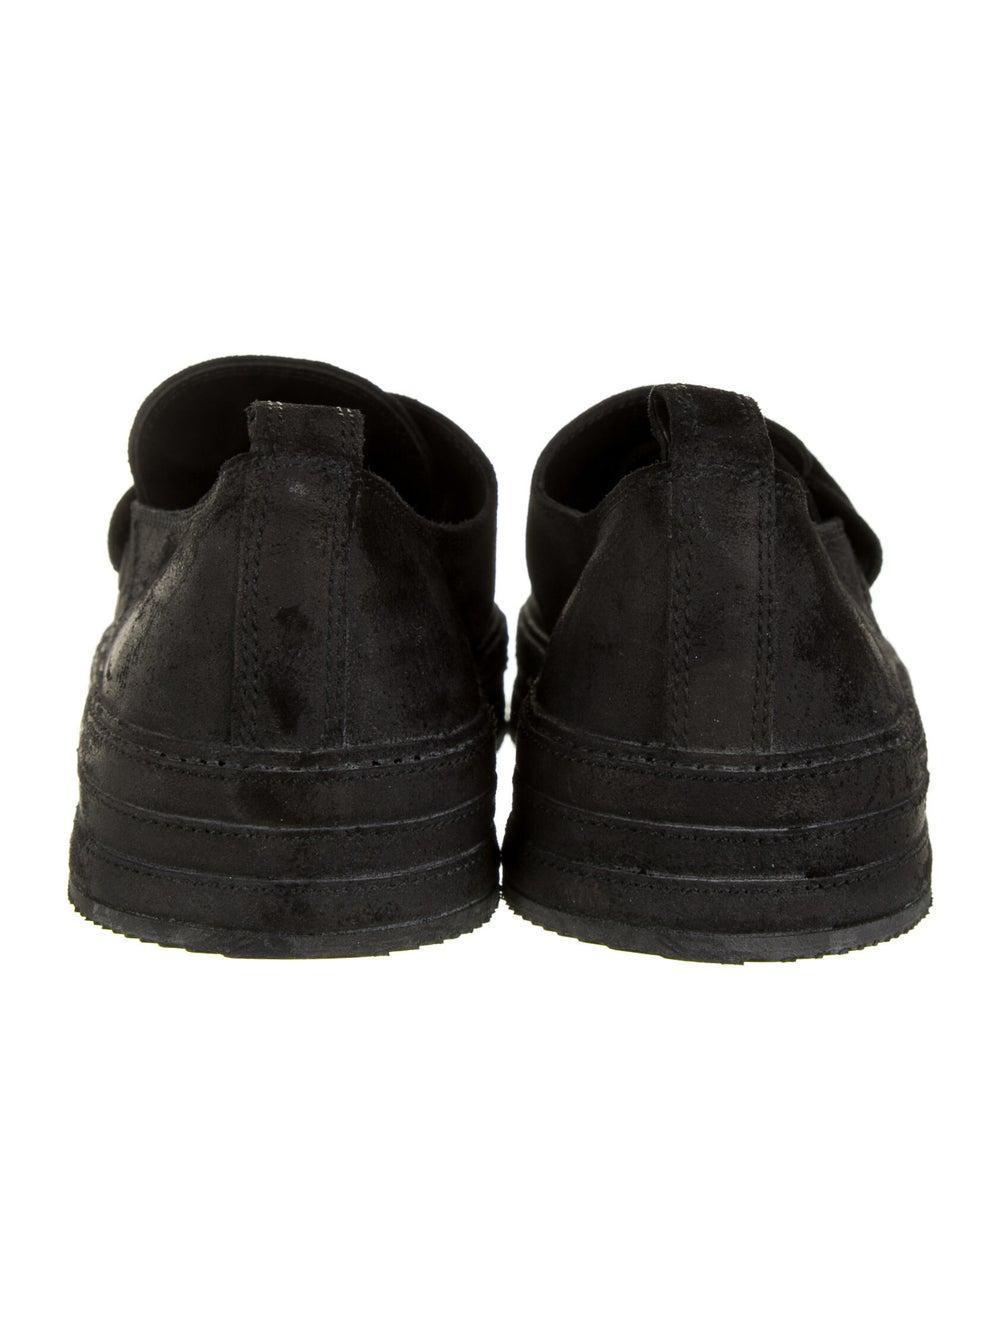 Ann Demeulemeester Suede Sneakers Black - image 4